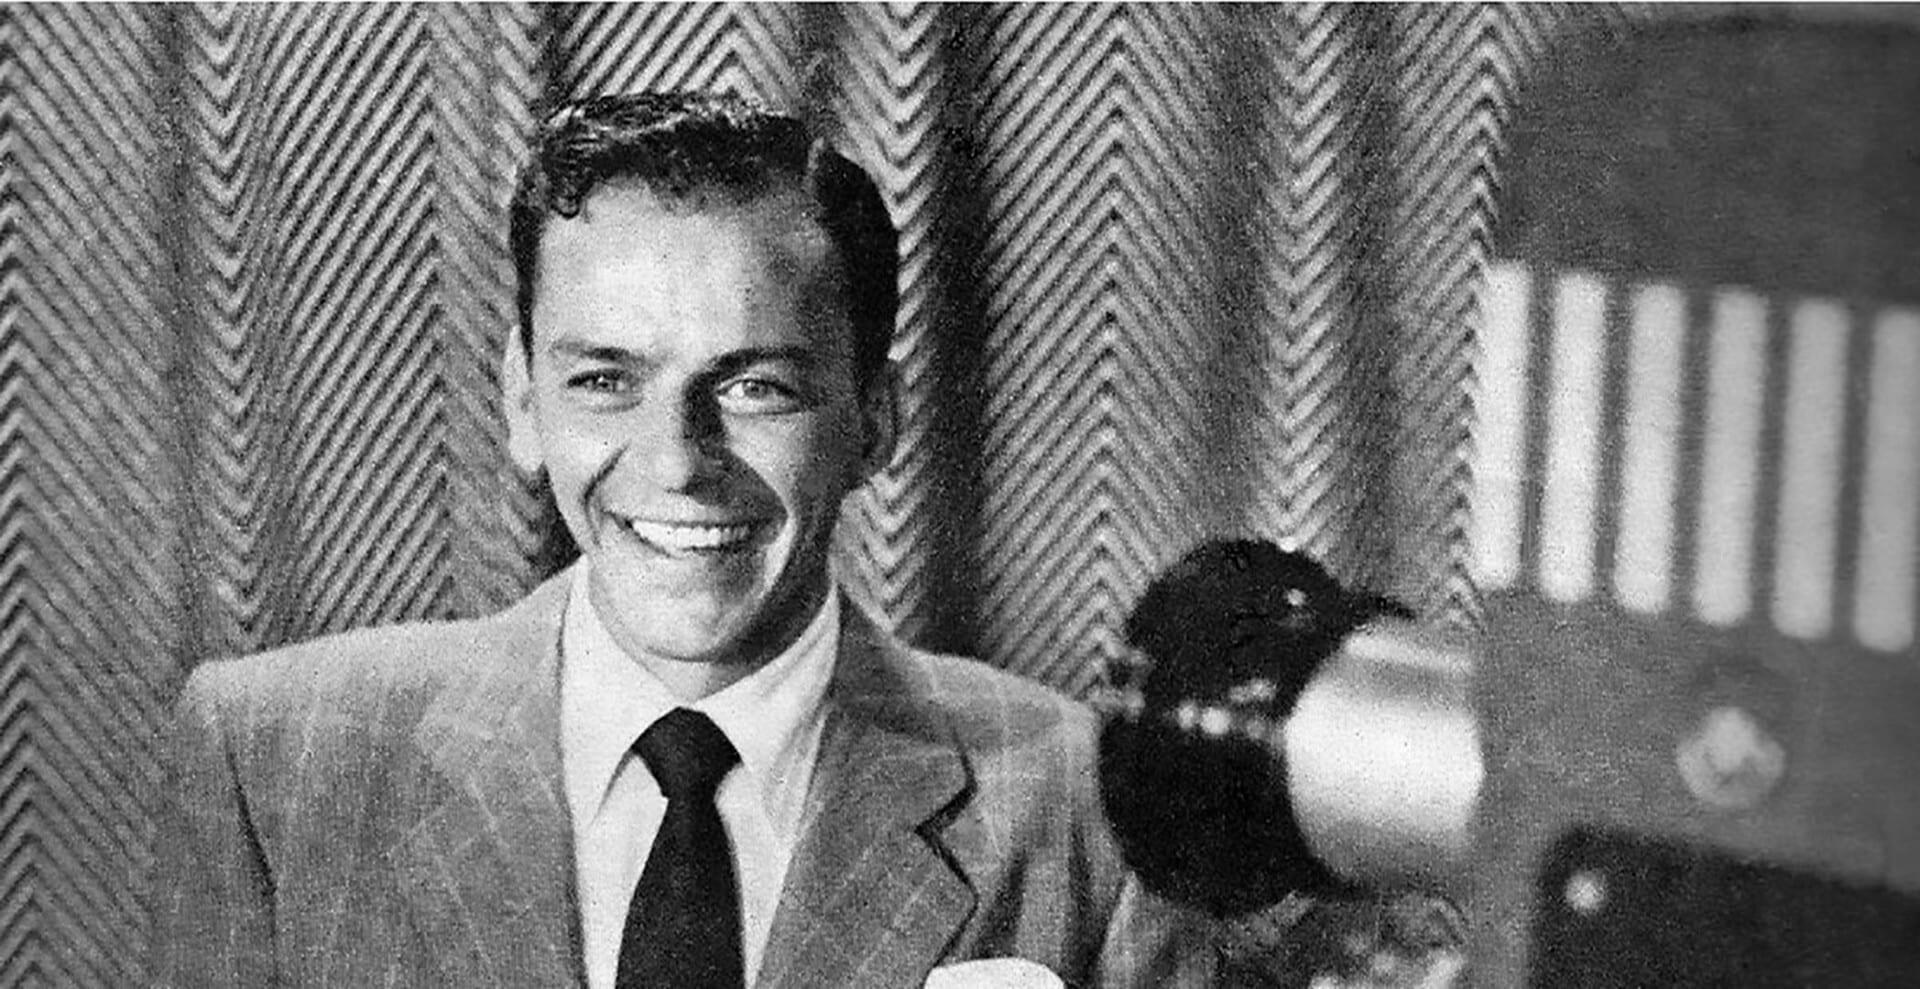 Sinatra Birthday Celebration See His Hoboken Haunts